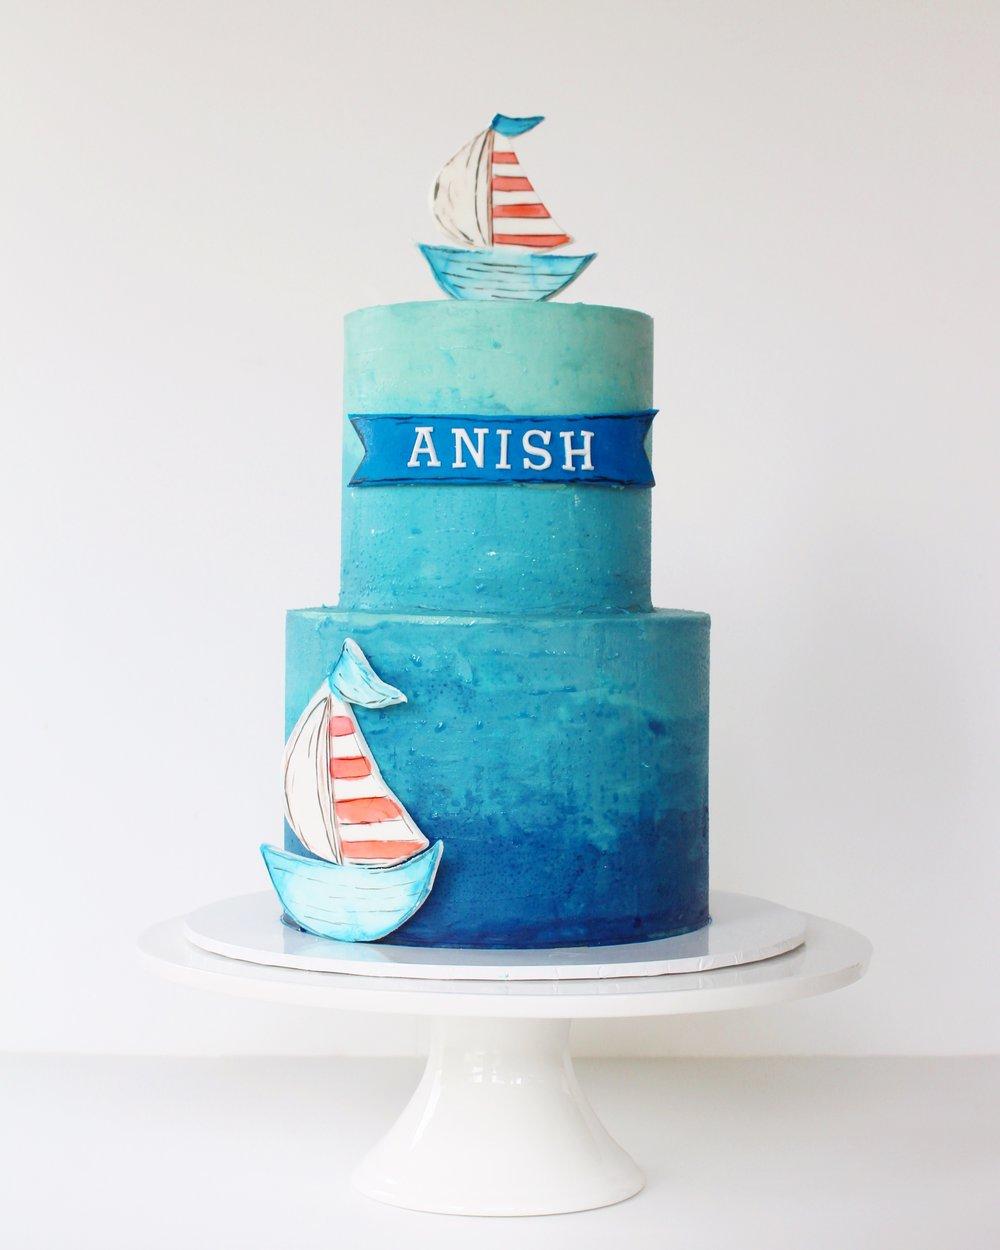 Anish